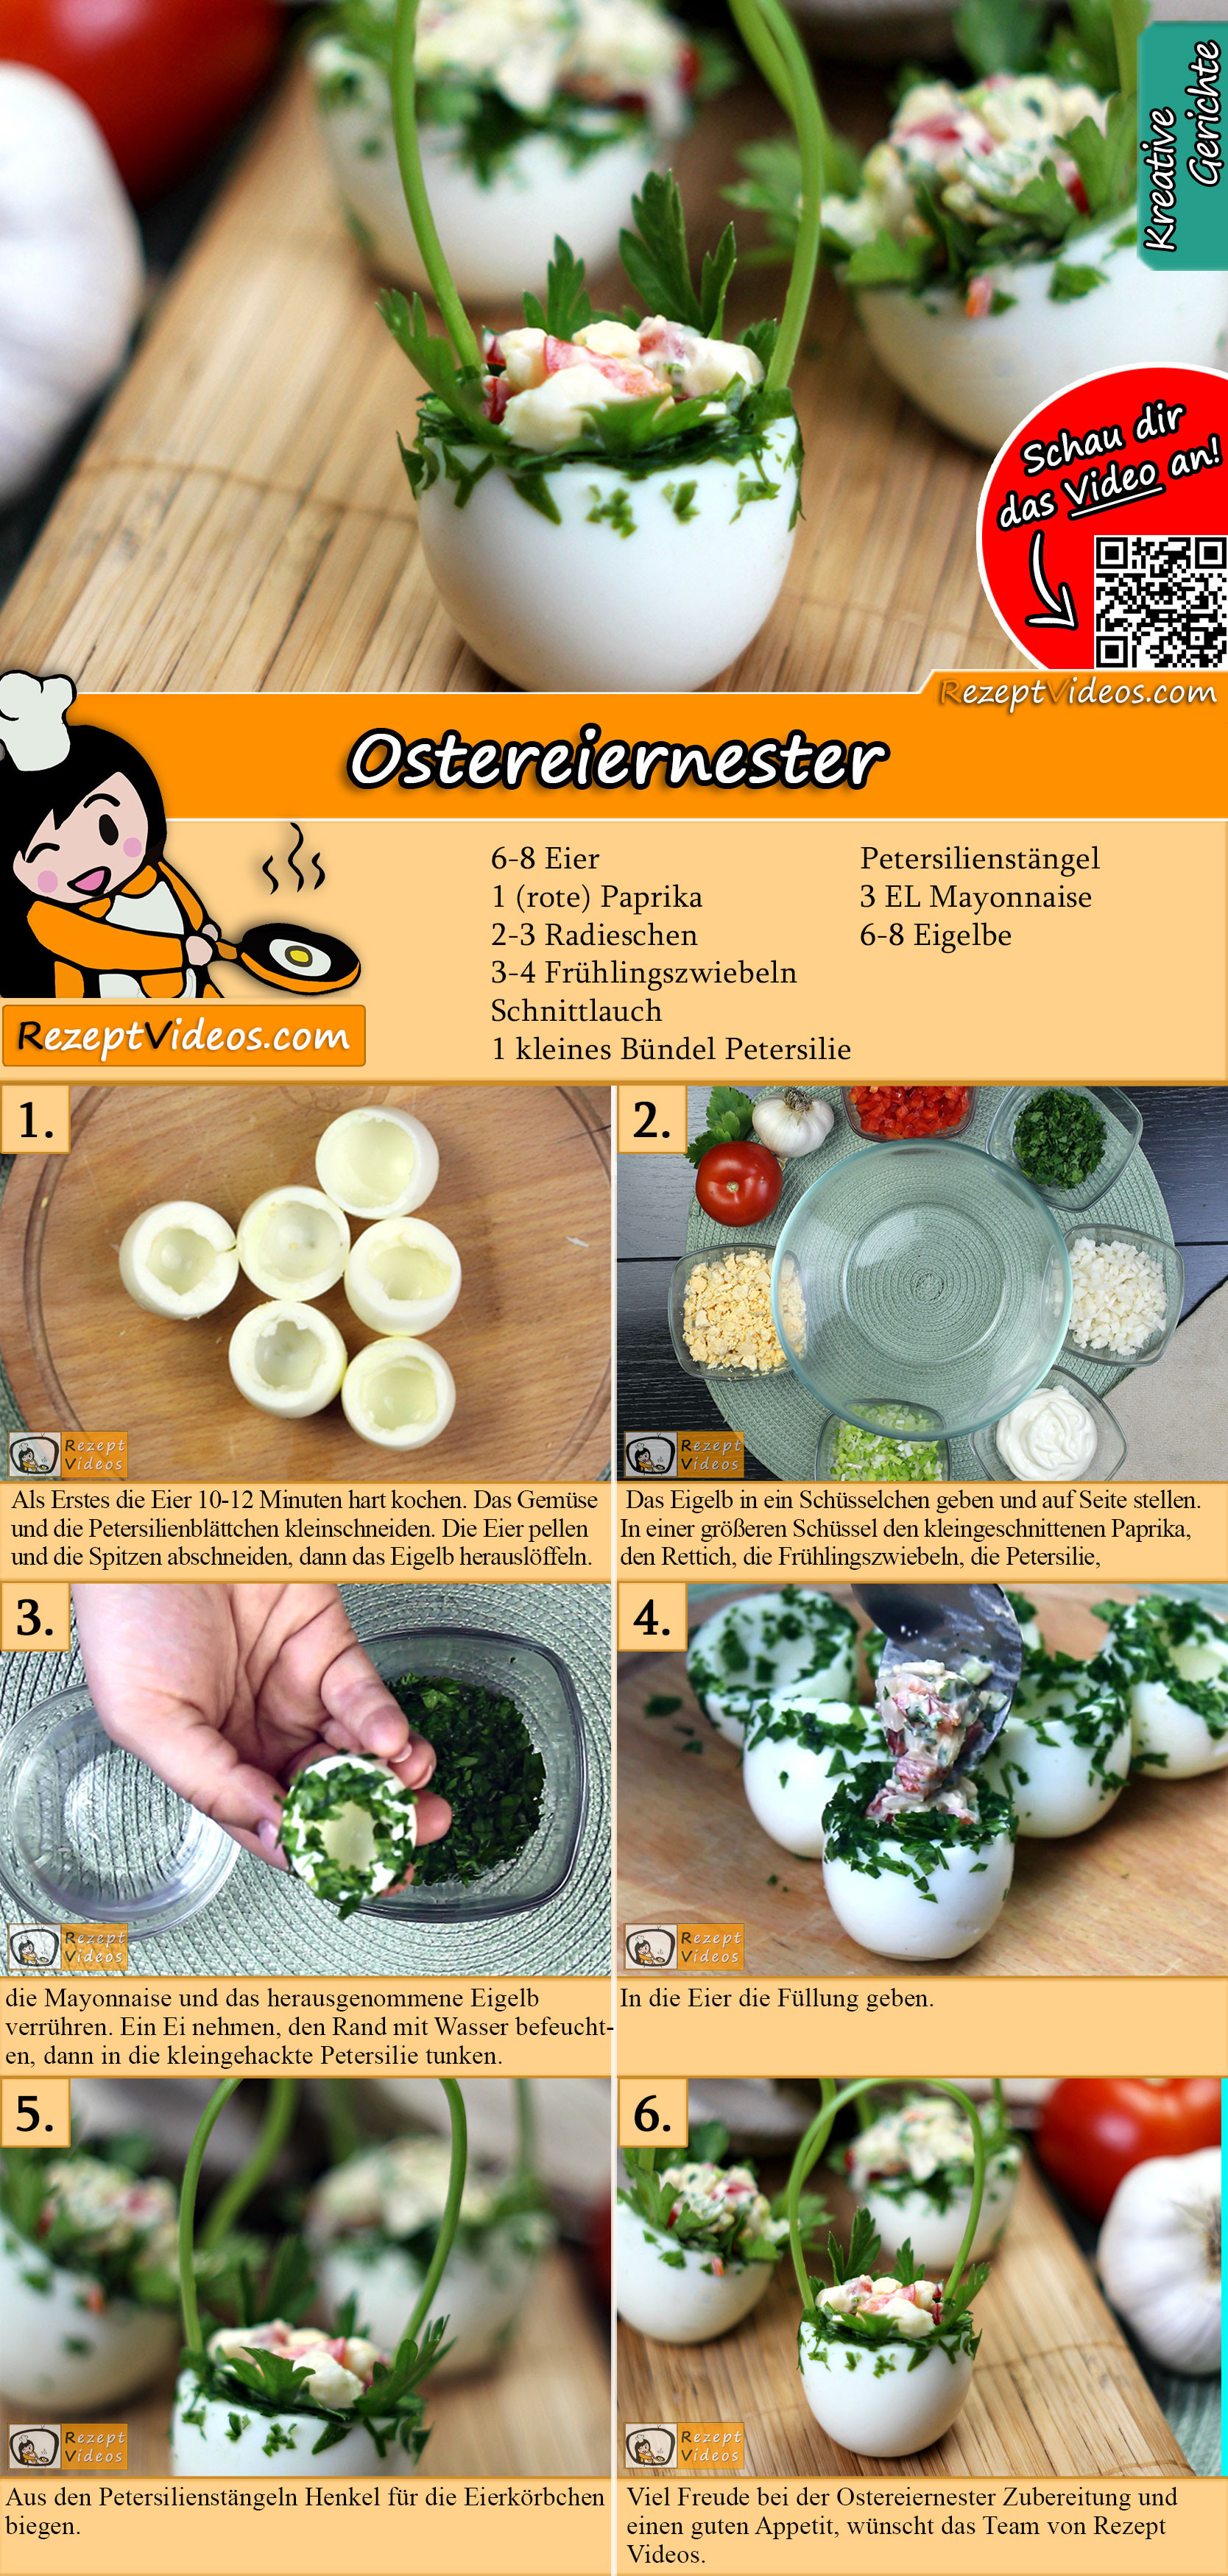 Ostereiernester Rezept mit Video